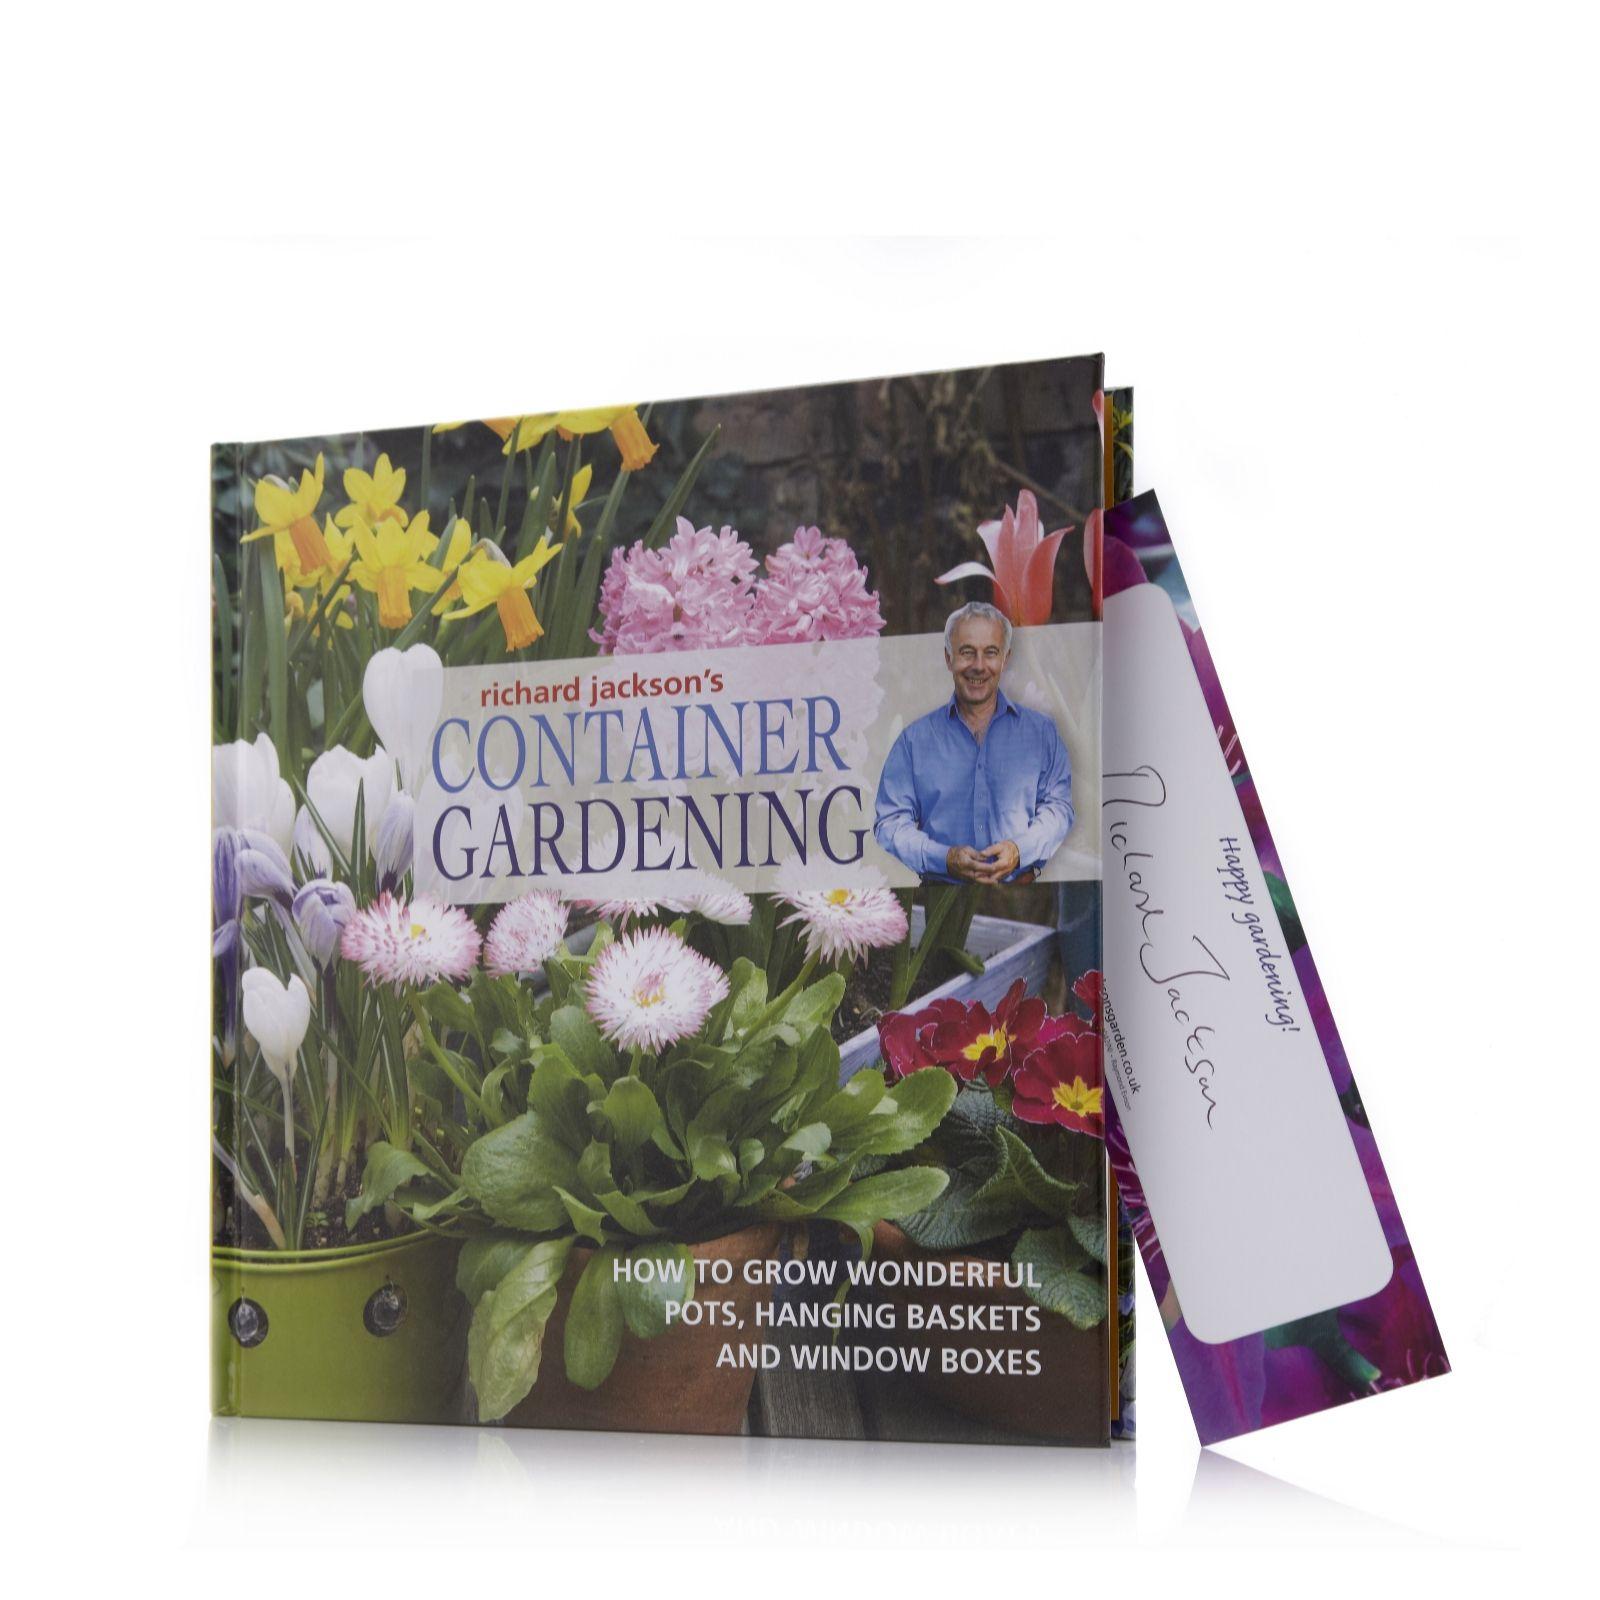 Richard Jacksonu0027s Container Gardening Hardback Book W/ Signed Bookmark    701351